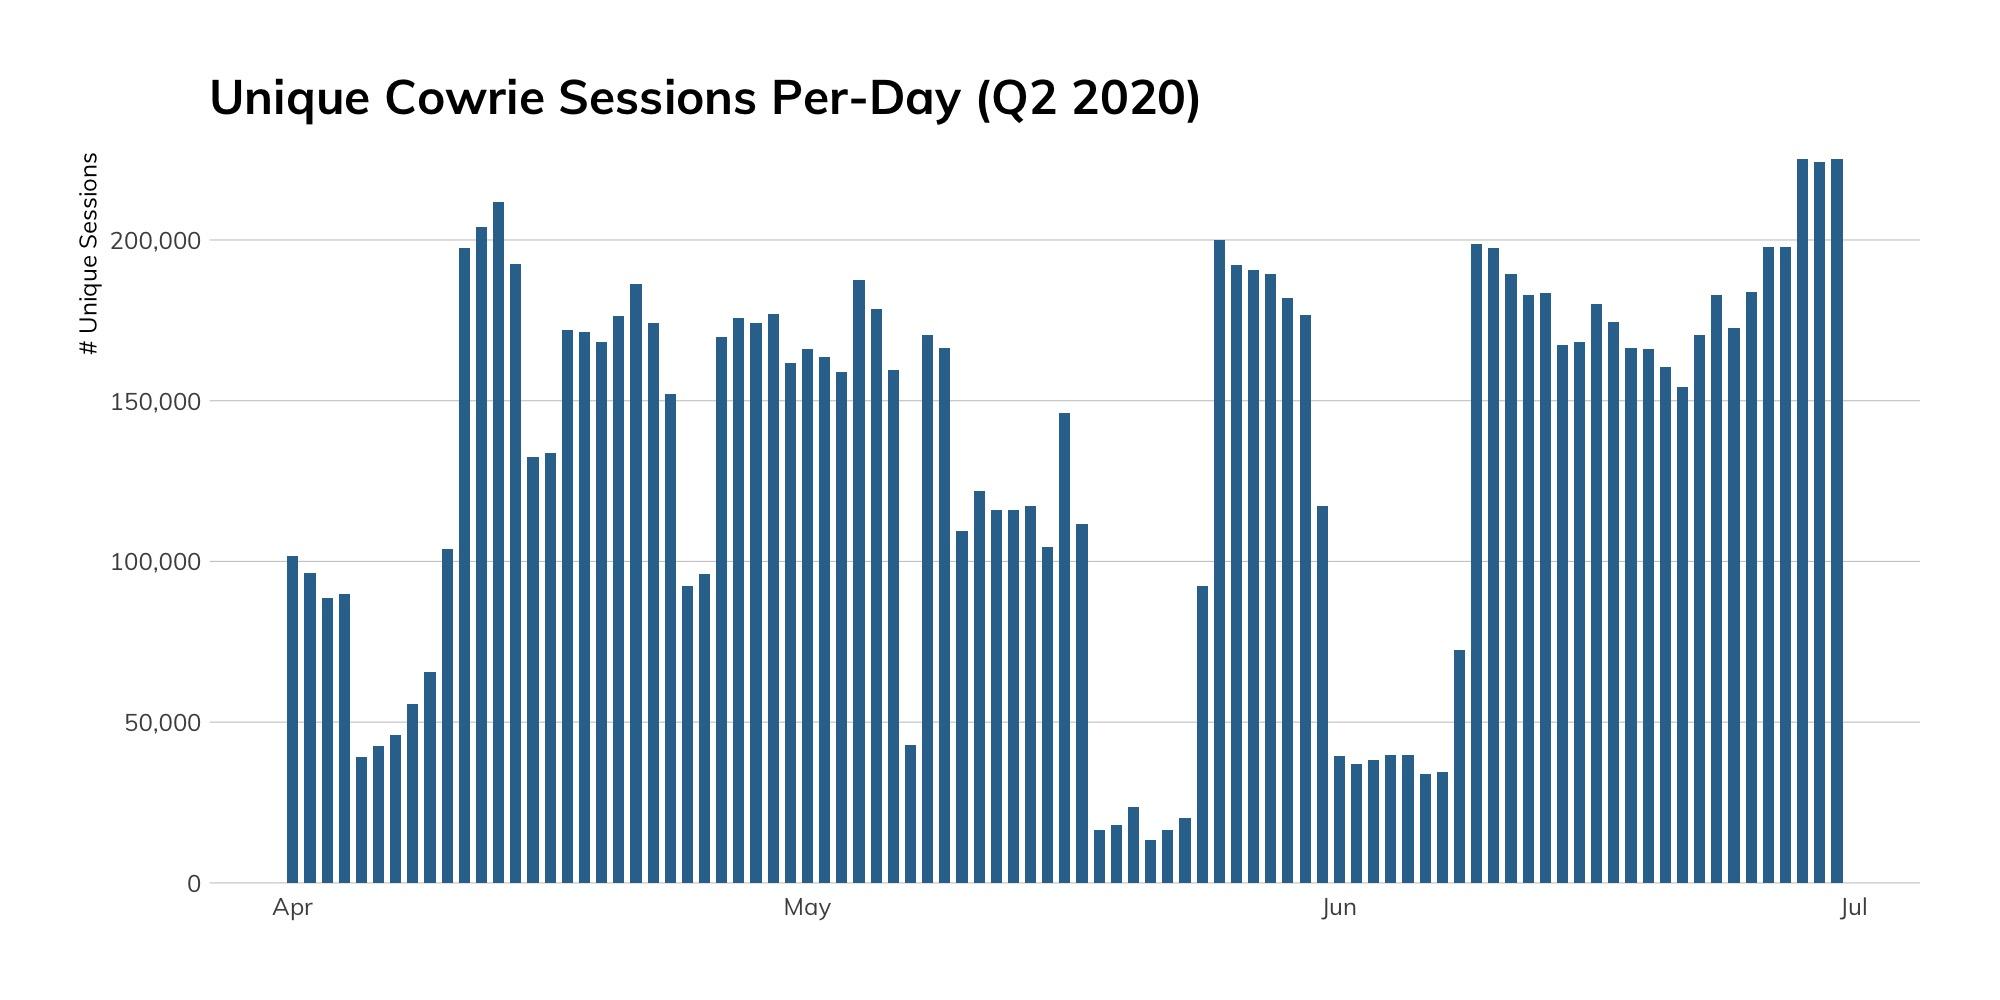 Figure 3: Unique Cowrie Sessions Per Day (Q2 2020)